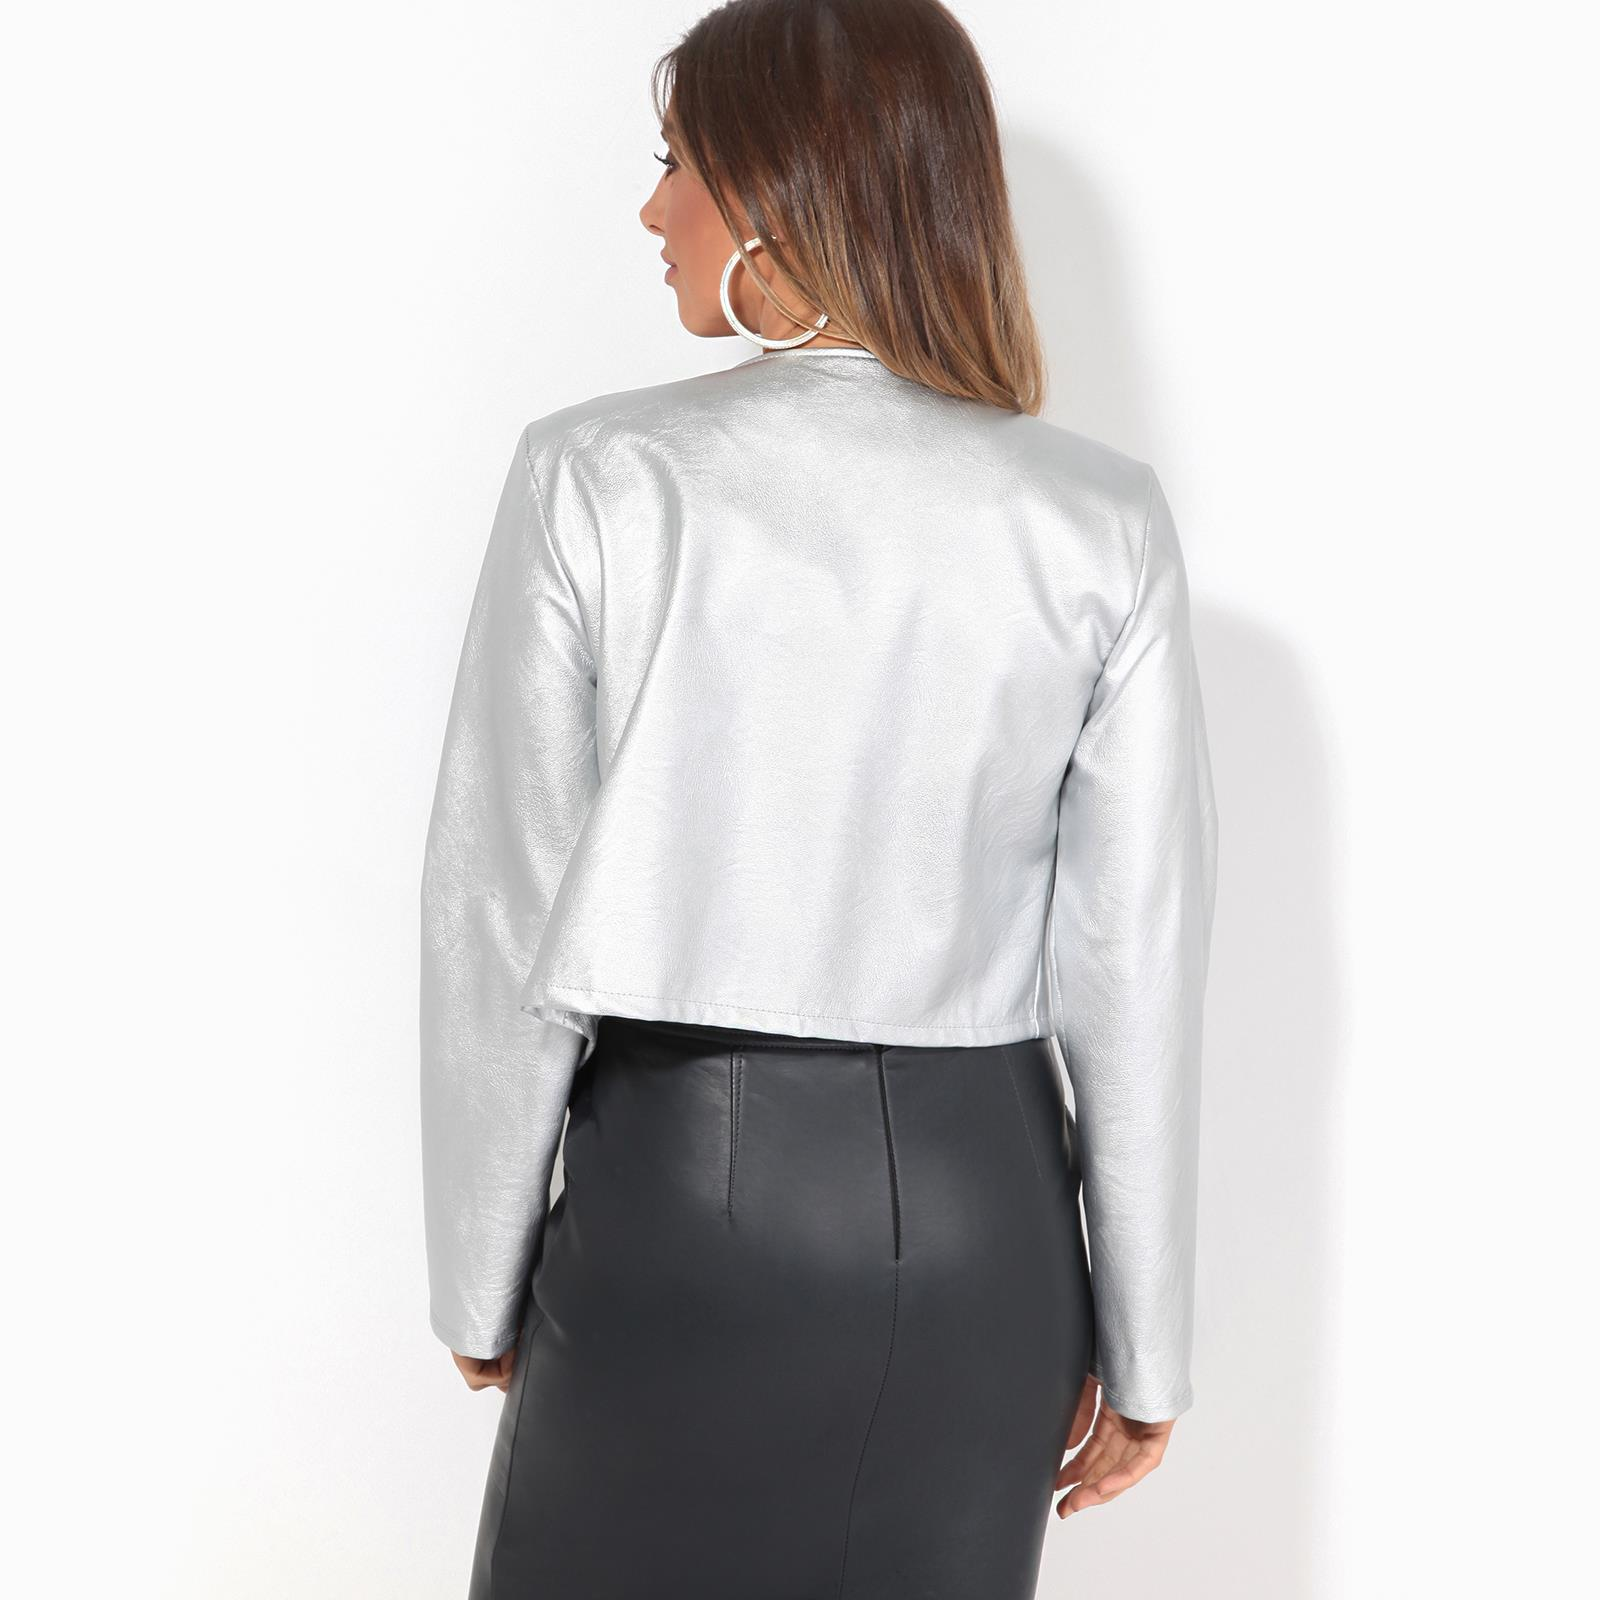 Womens-Ladies-PU-Leather-Biker-Jacket-Open-Bolero-Short-Coat-Shrug-Cropped-Top thumbnail 13